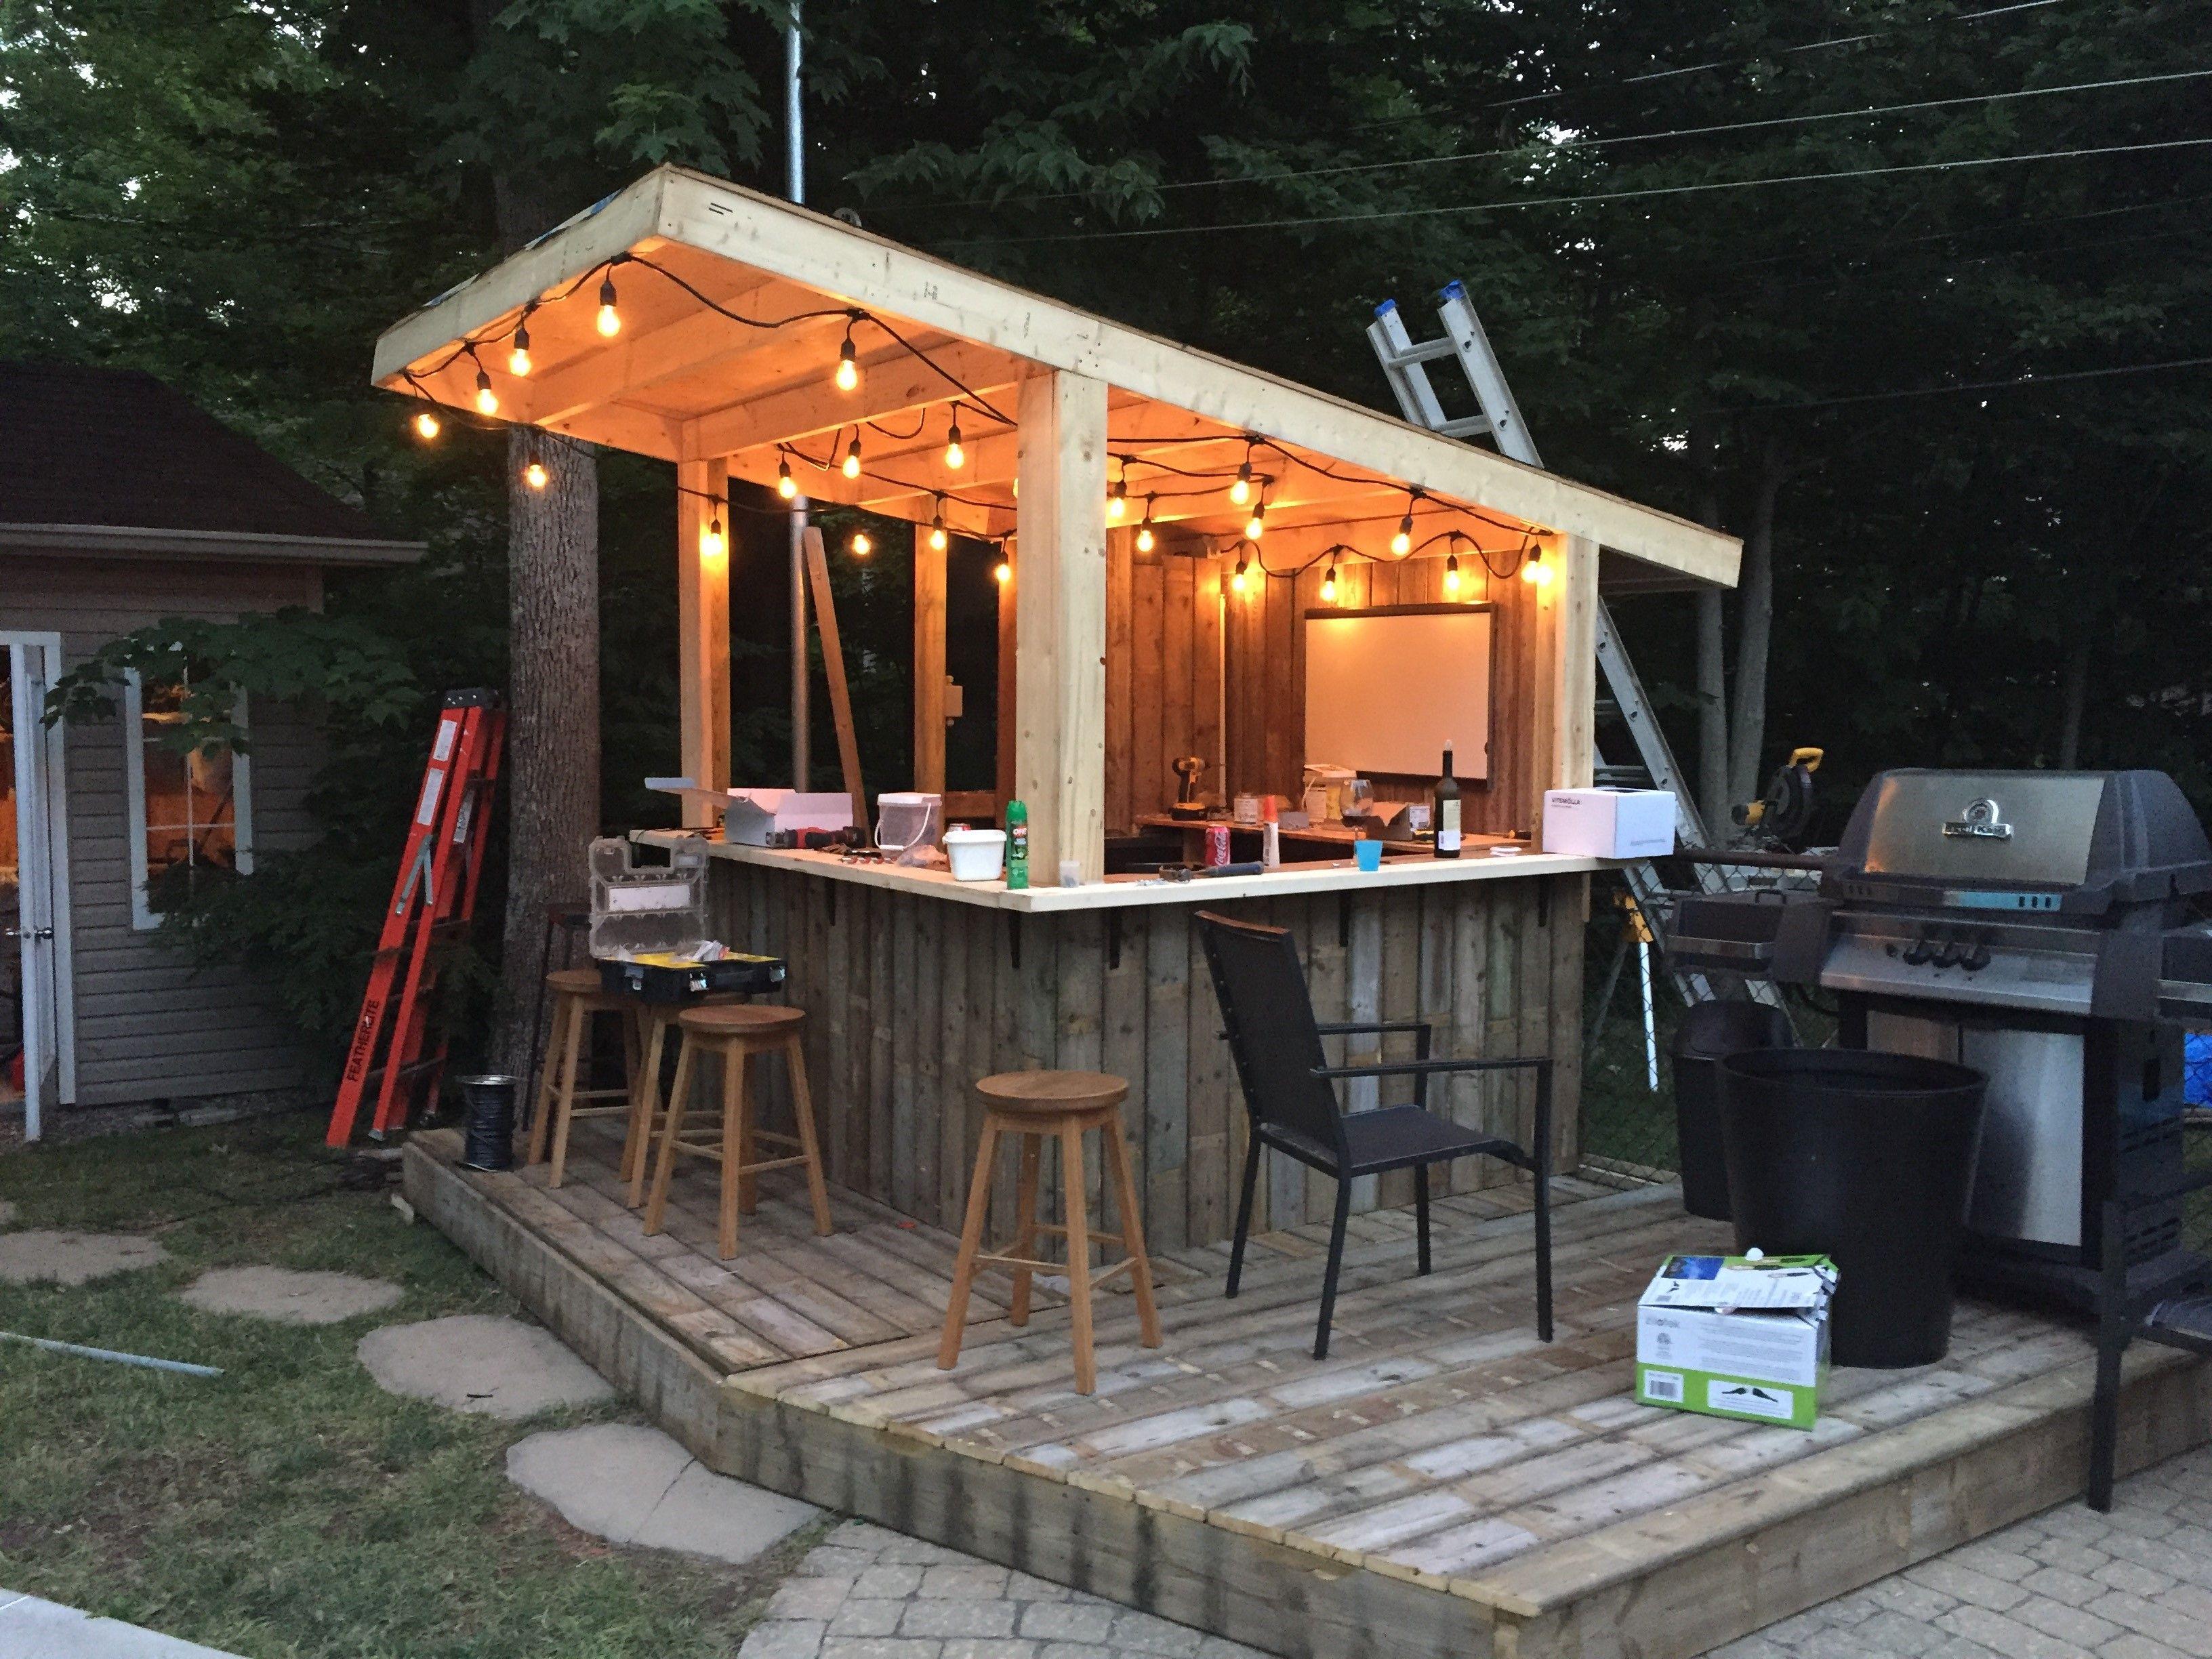 Shed Plans Shed Plans Tiki Bar Backyard Pool Bar built with – Patio Tiki Bar Plans